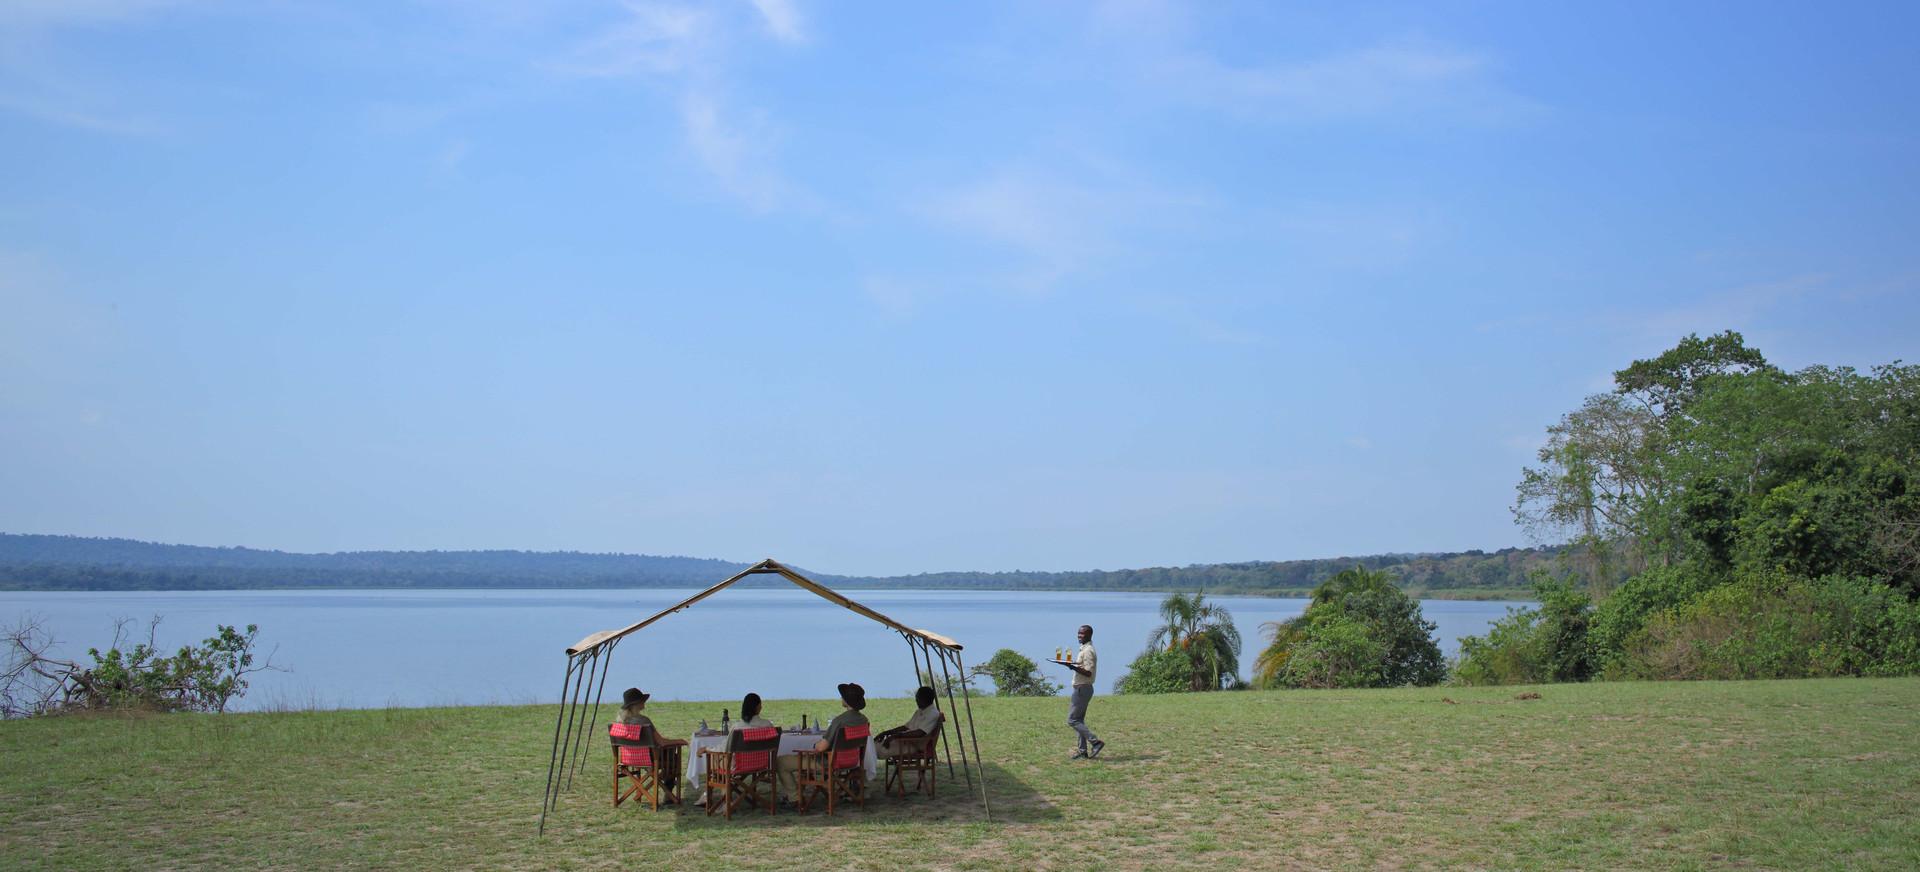 Lunch at Lake Victoria Rubondo Island Tanzania